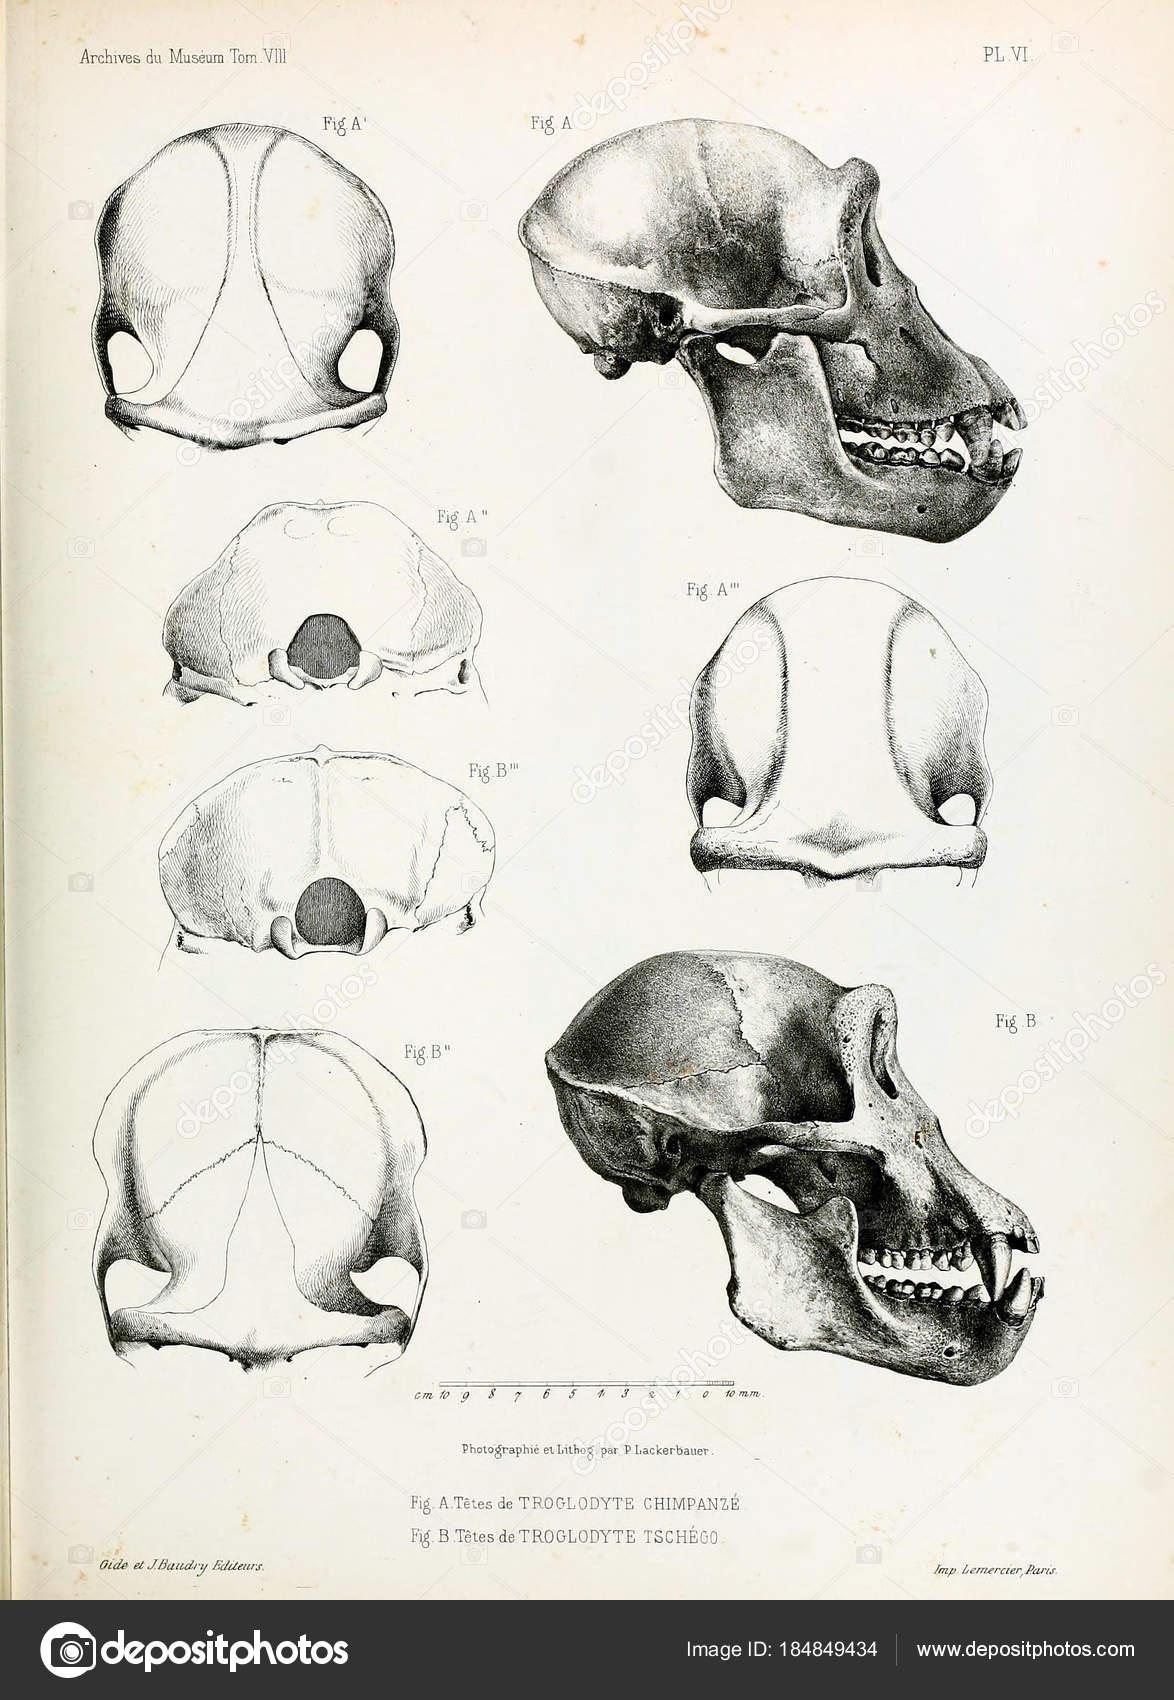 Anatomy Ape Archives Musum Histoire Naturelle Paris — Stock Photo ...